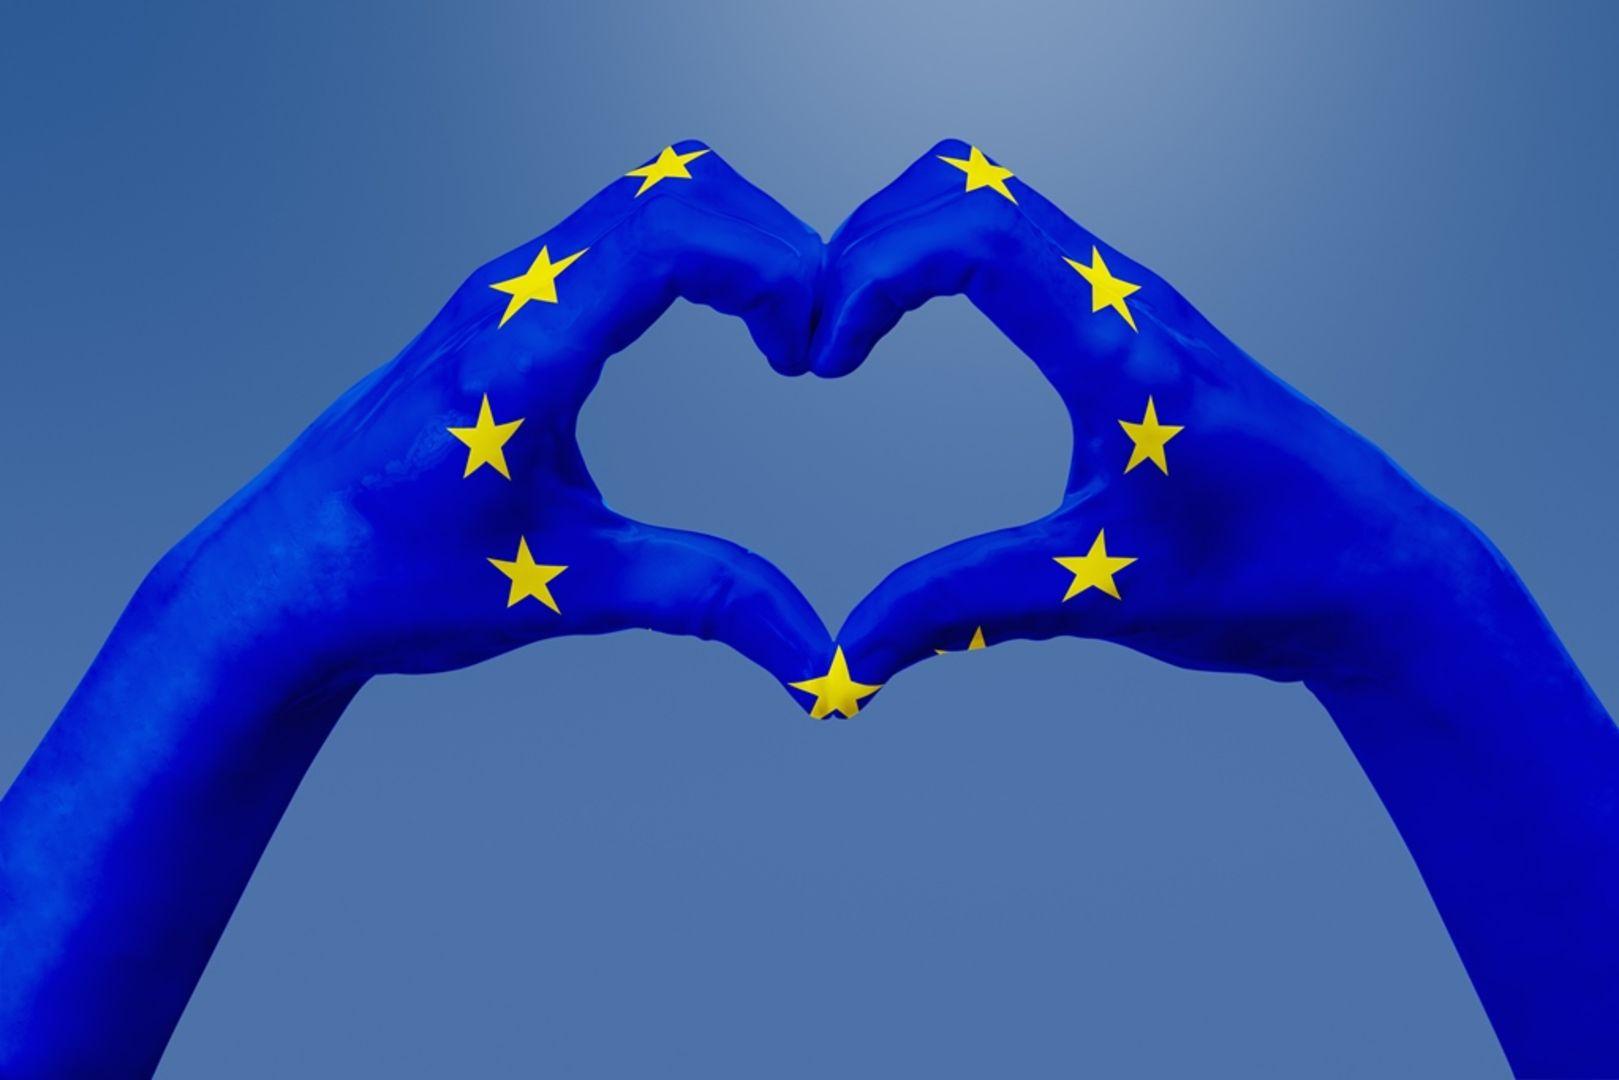 Europa Frieden